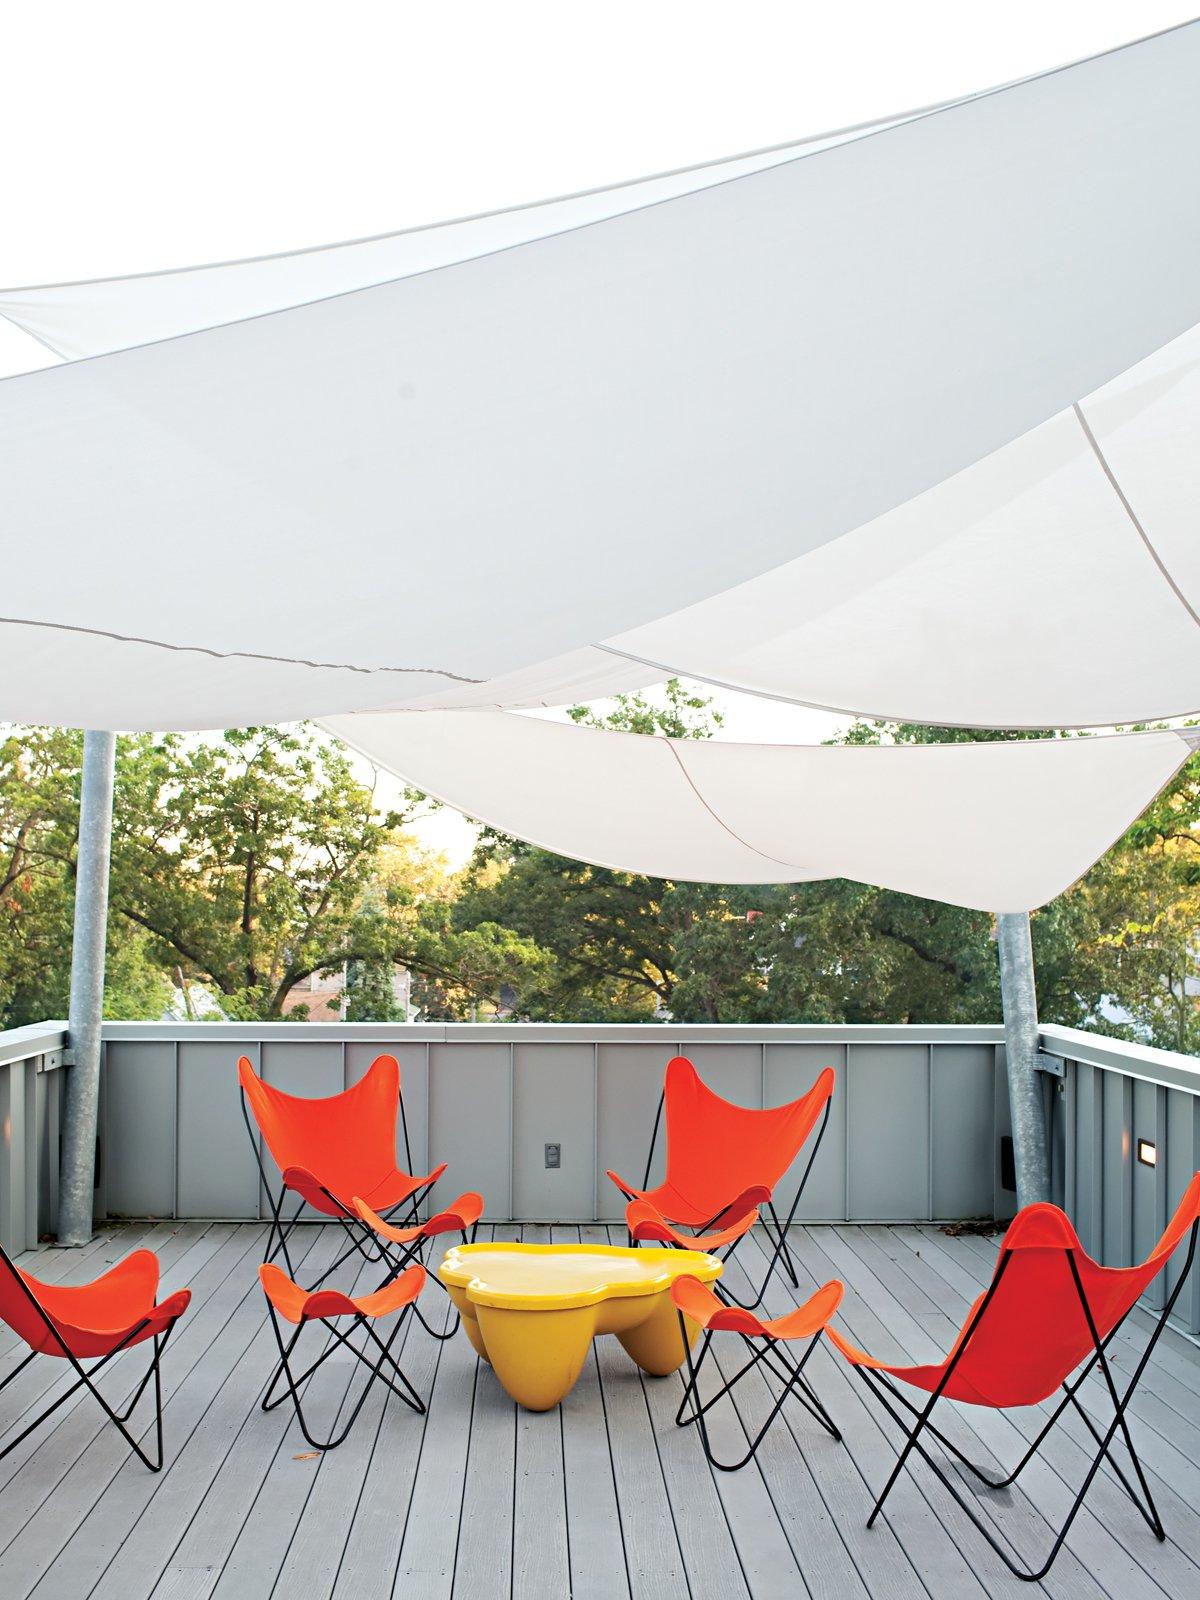 #exterior #design #balcony #mermet #mermetsunsails #veranda #manmadeplanks #planks #orange #bright #brightcolors #colors #yellow #deSalvo #sunshade #solarscreenfabric #screen #coversunlimited  #modern  36+ Interior Color Pop Ideas For Modern Homes by Dwell